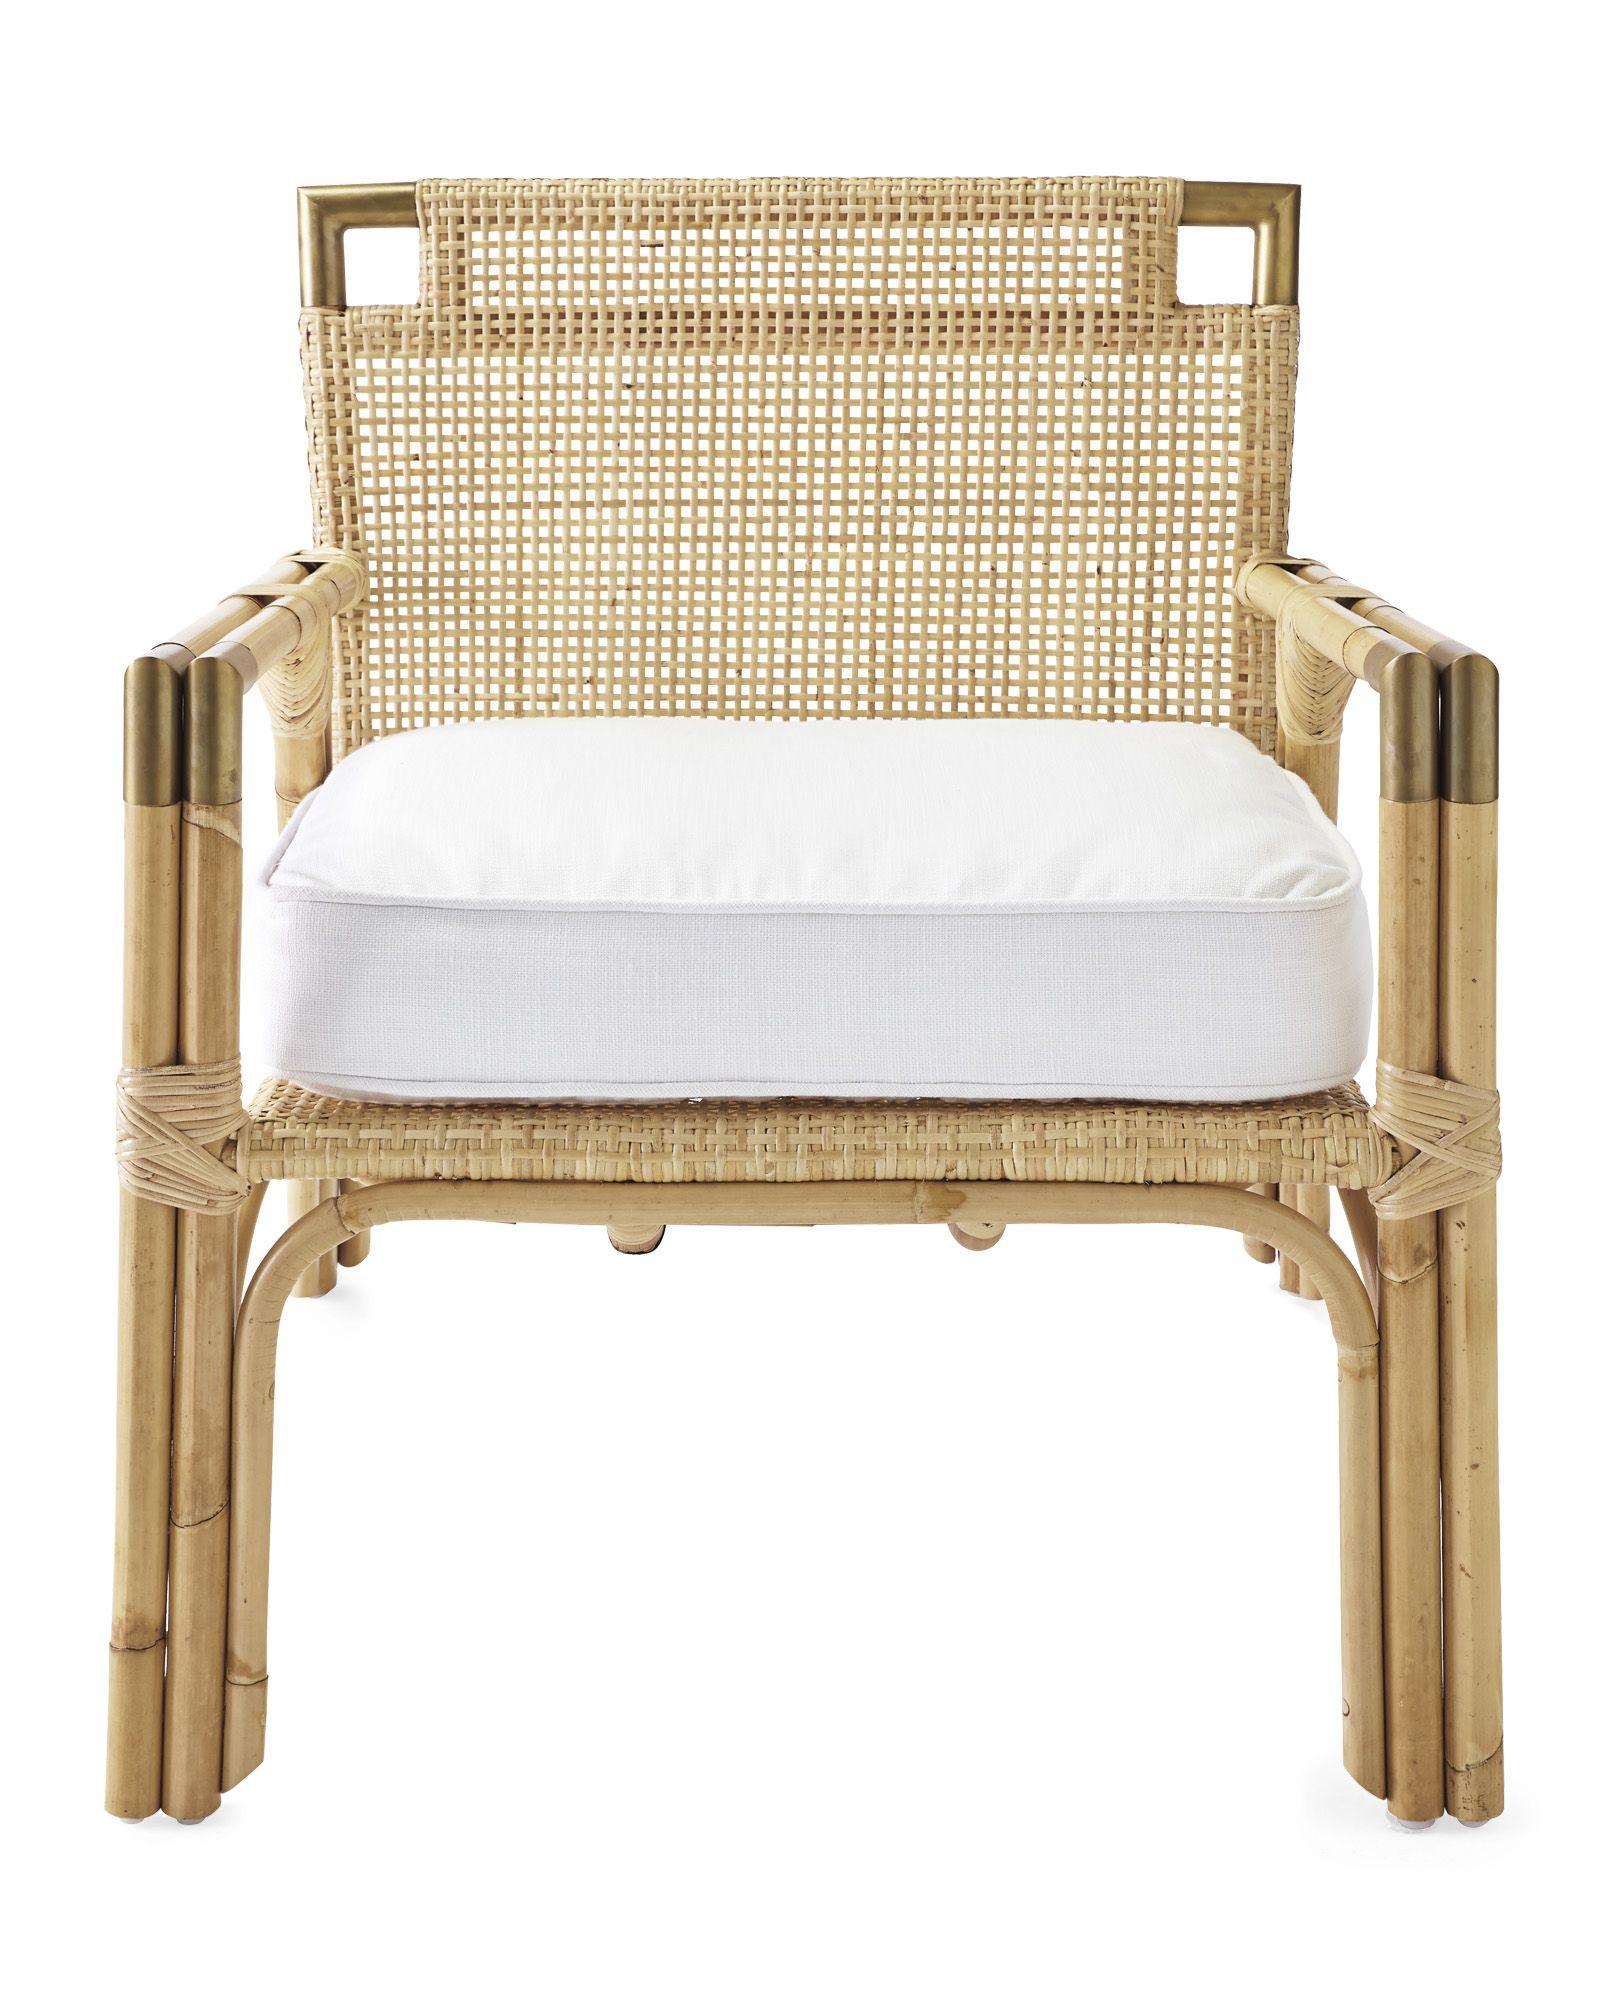 bedroom chair under £100 frank lloyd wright barrel swell seasonal spring home decor edit pinterest